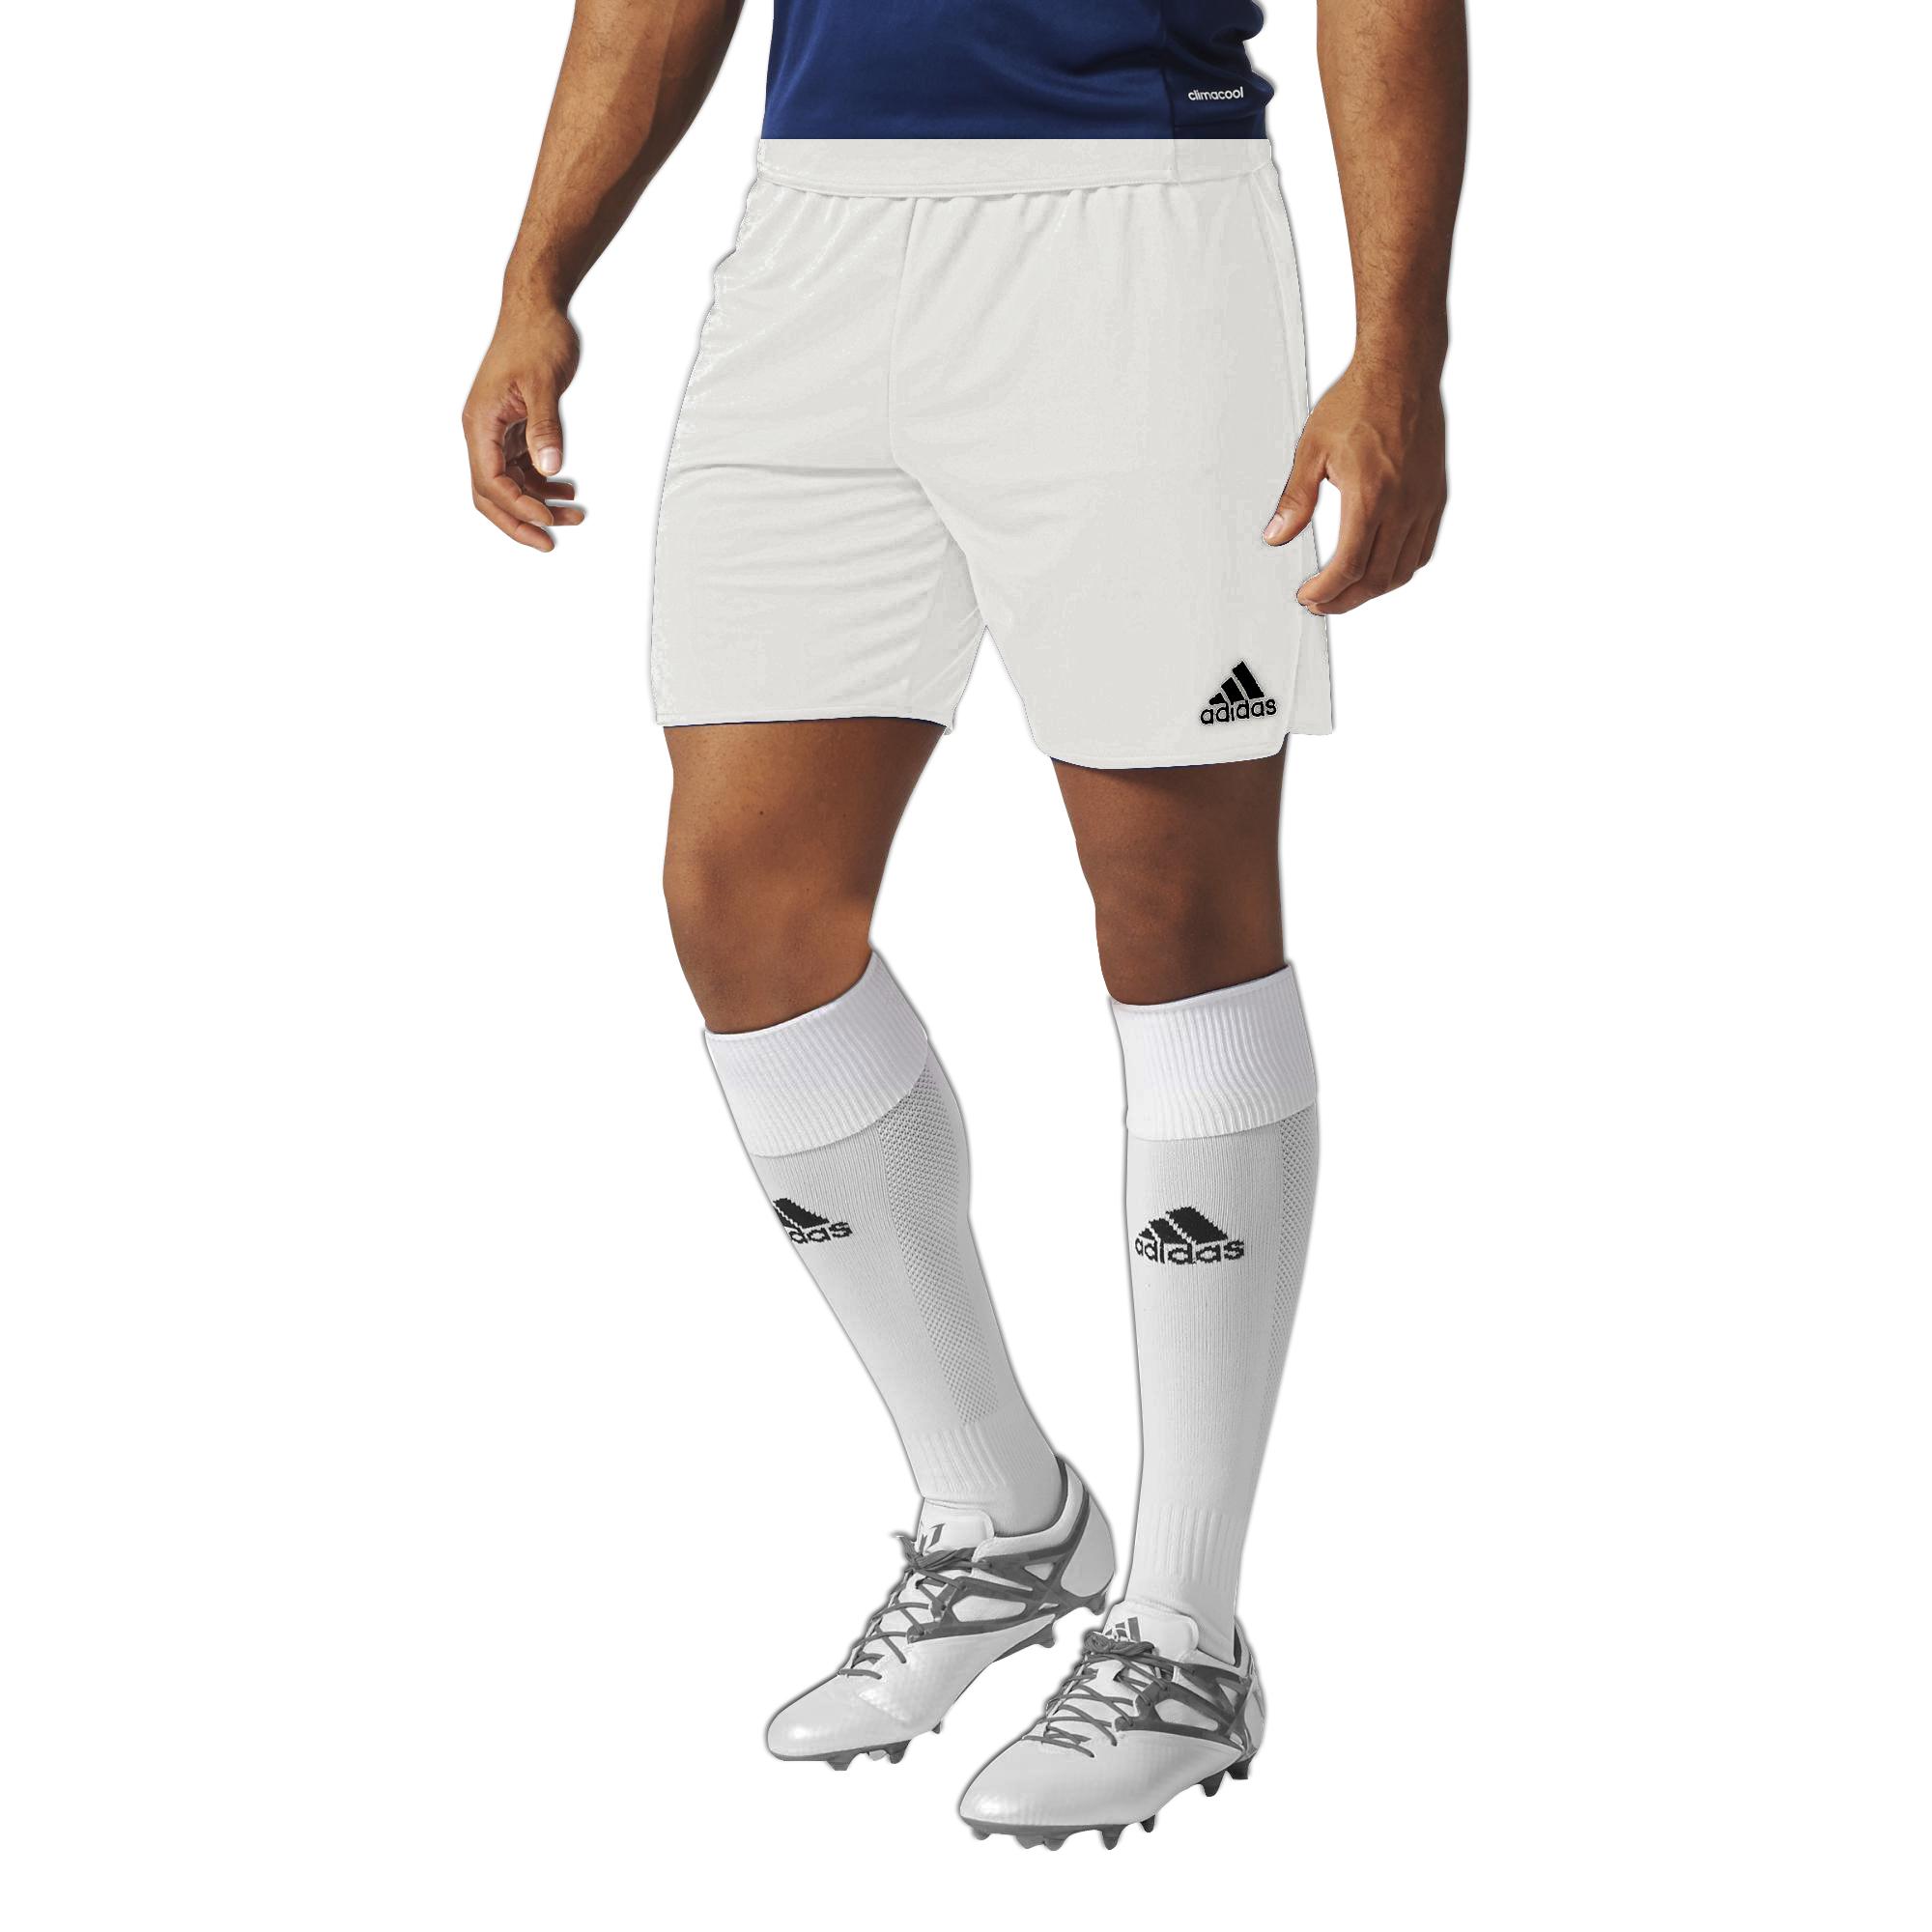 Adidas Men's Parma Football Training Team Wear Shorts ...